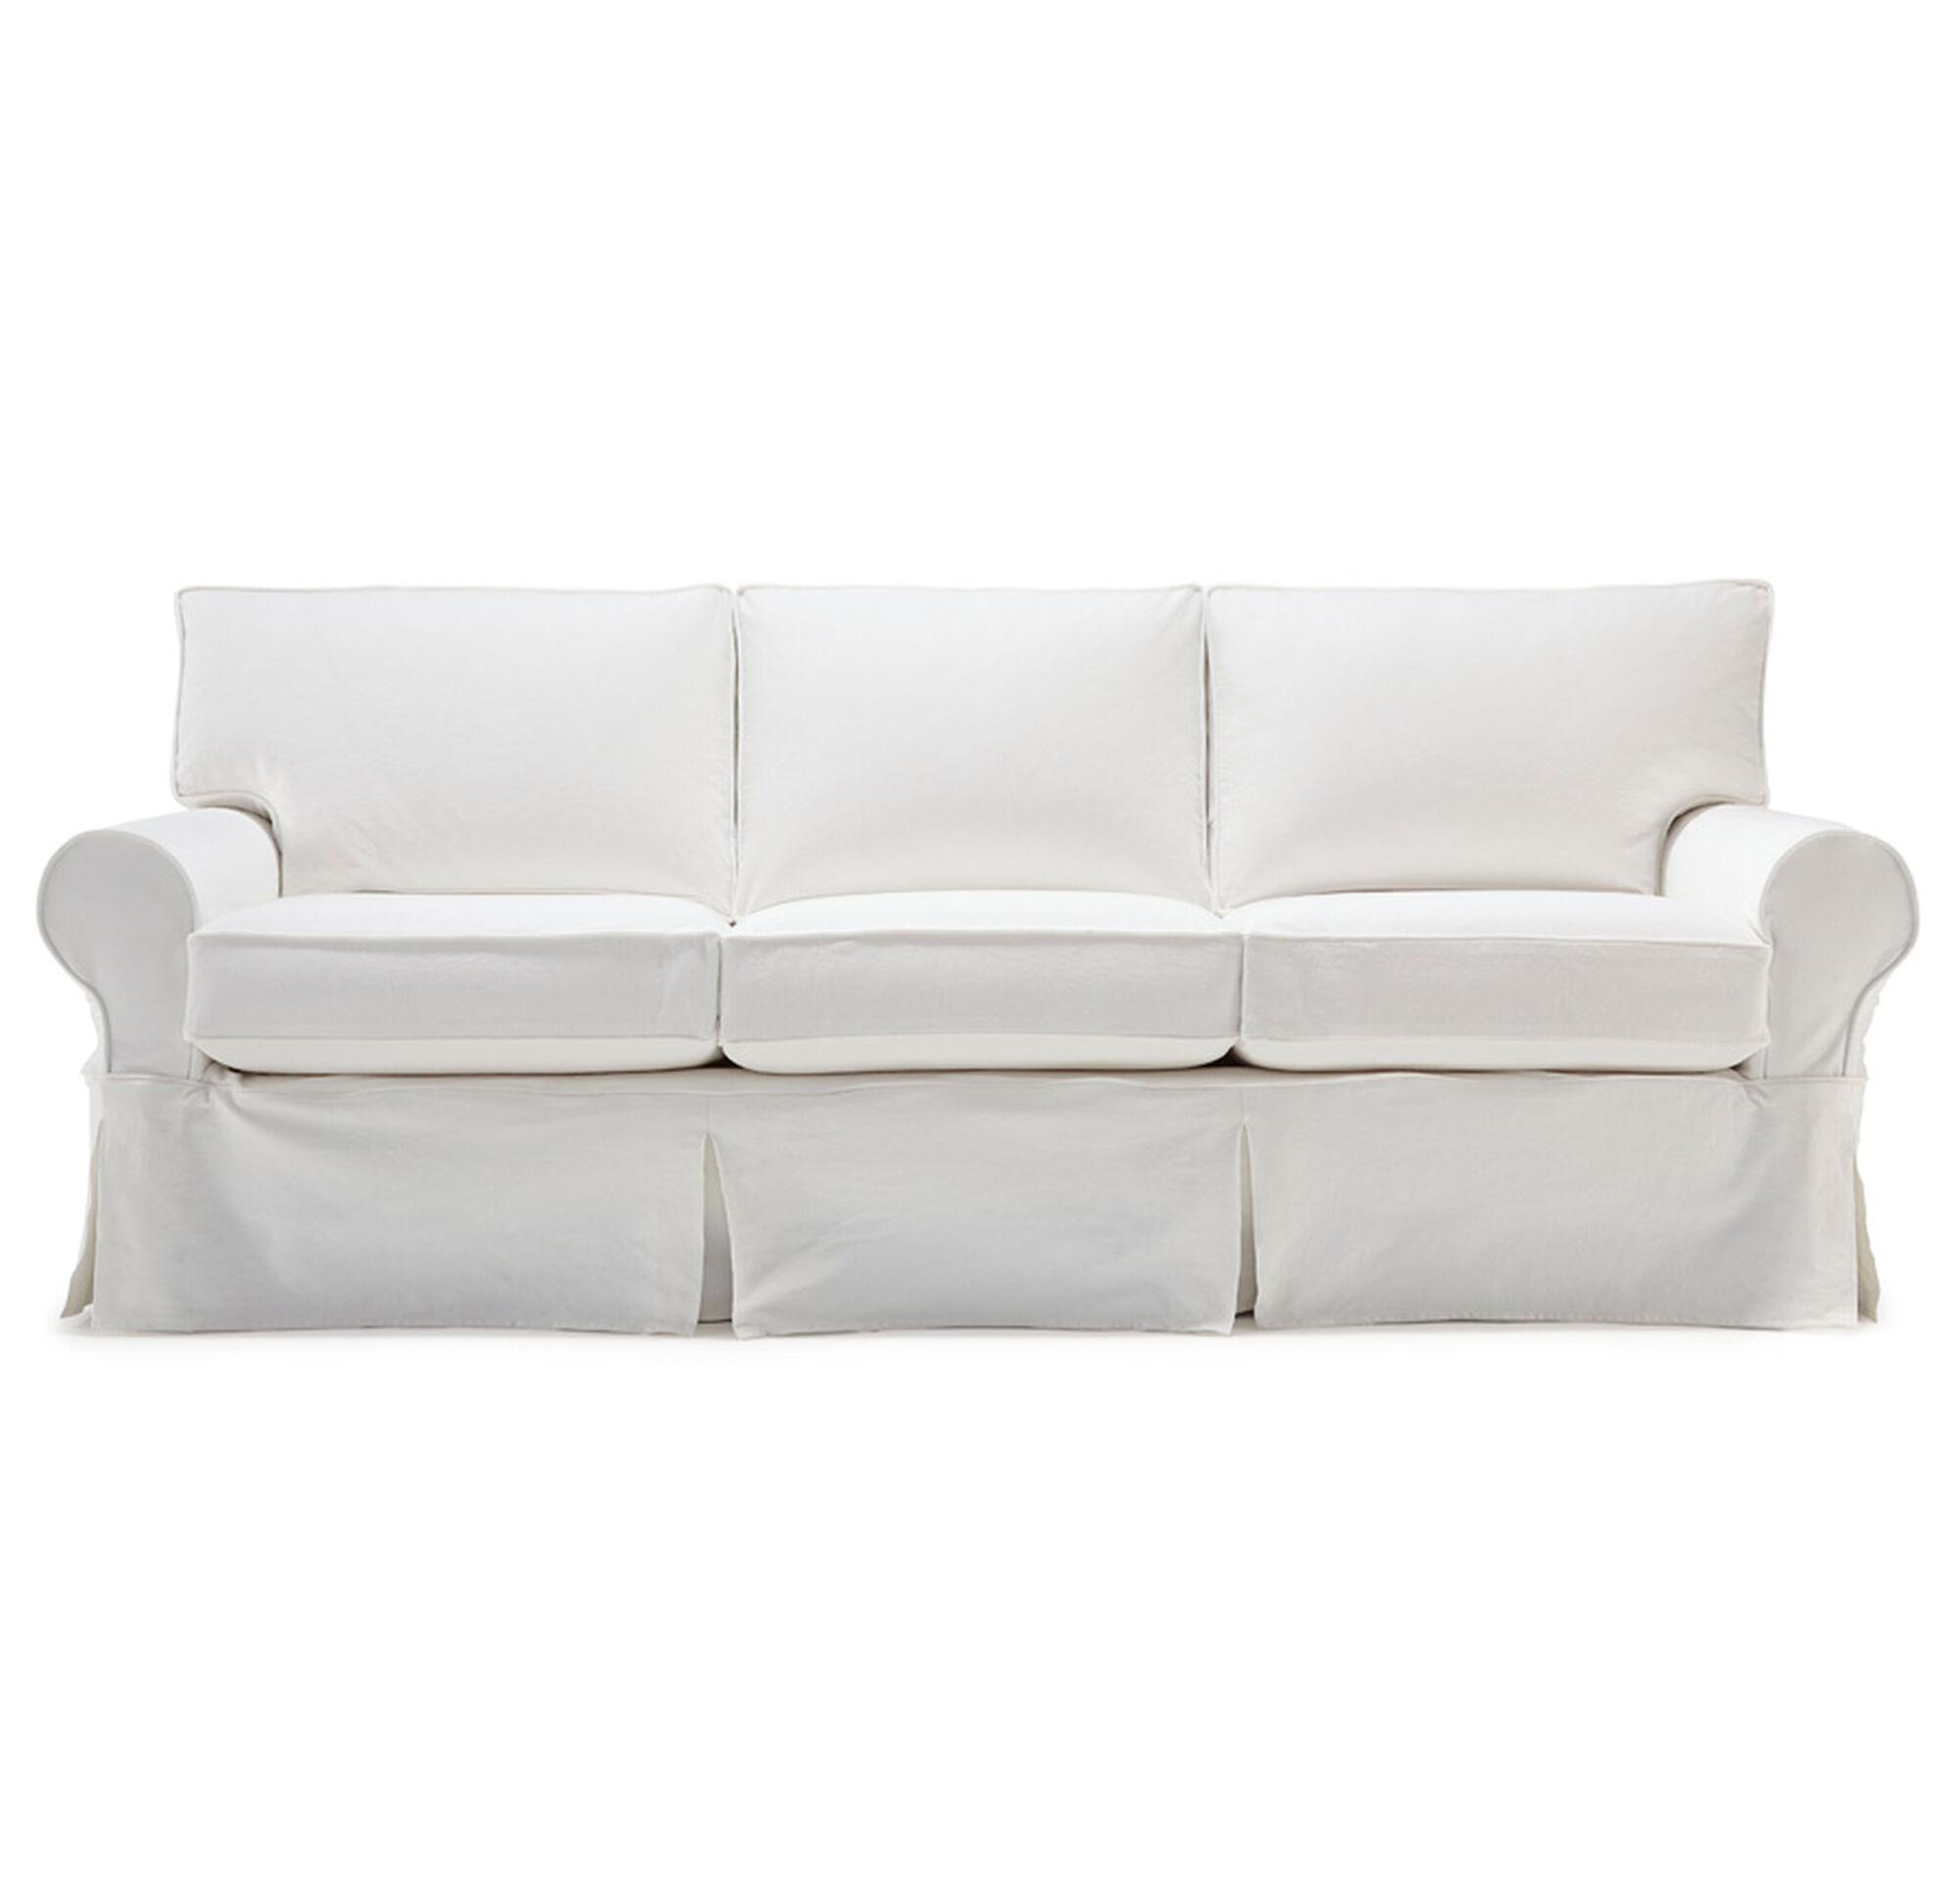 Alexa Ii Luxe Queen Slipcover Sleeper Sofa Bull Denim White Hi Res